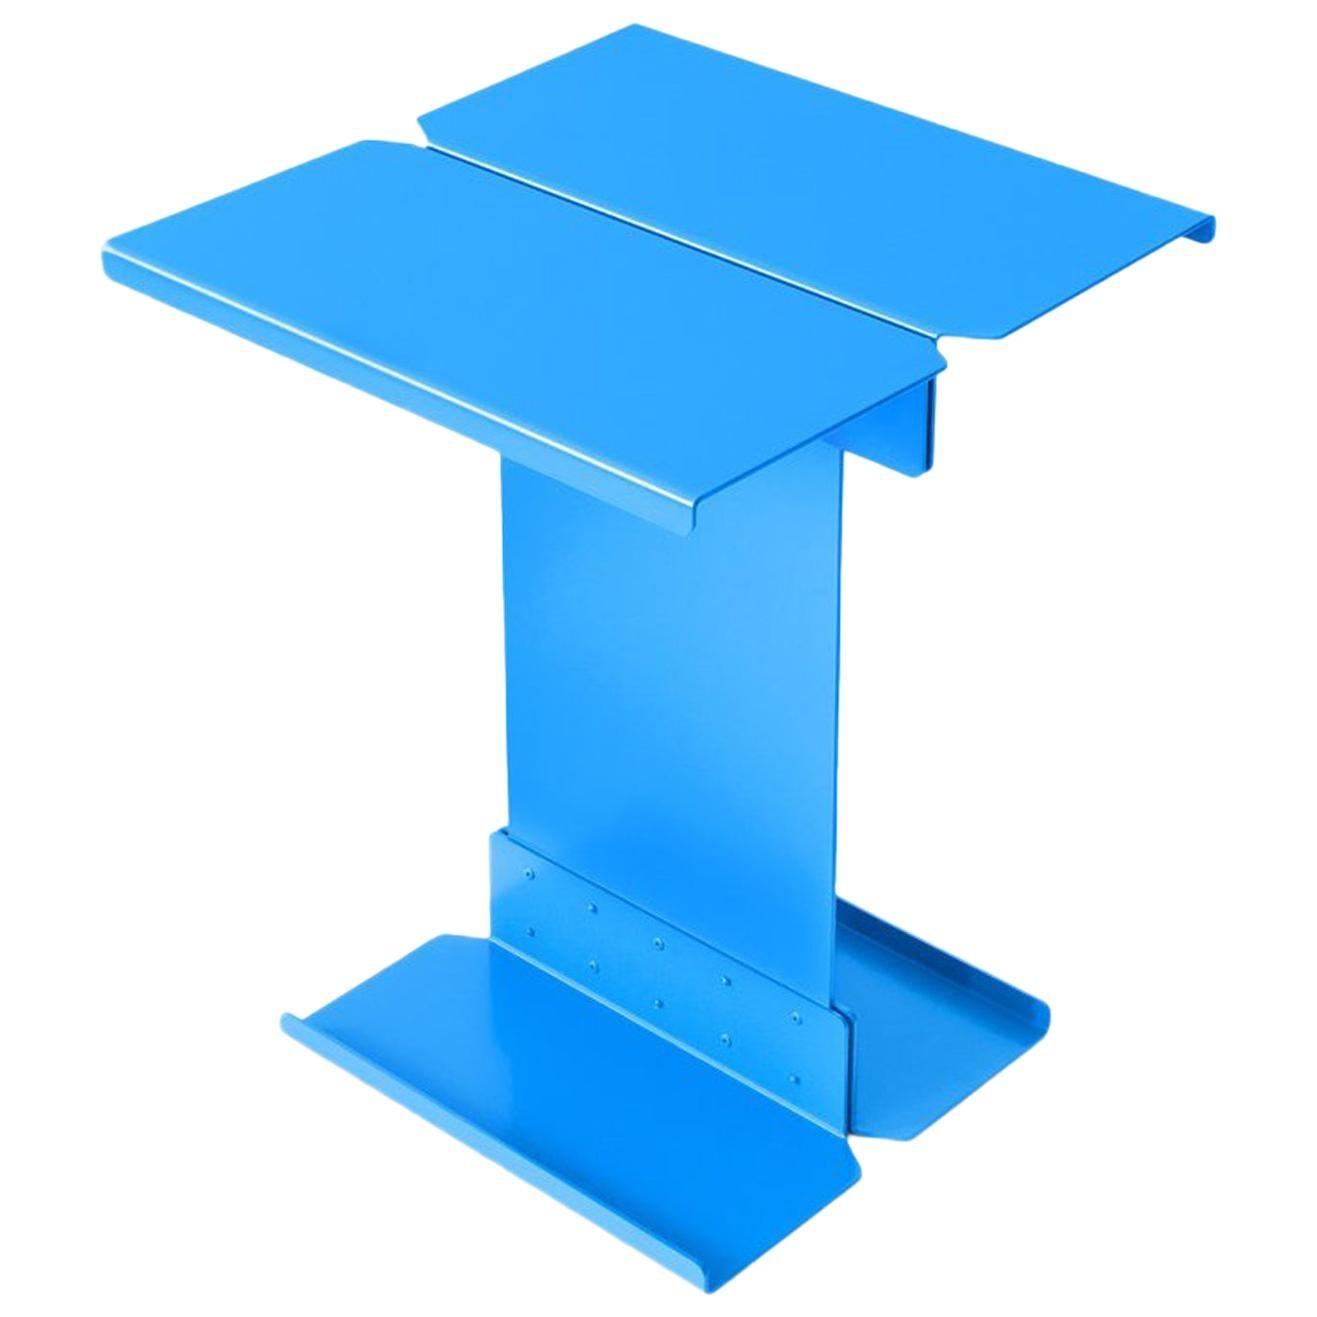 Adolfo Abejon Contemporary 'Five' Blue Metal Sculptural Coffee Table